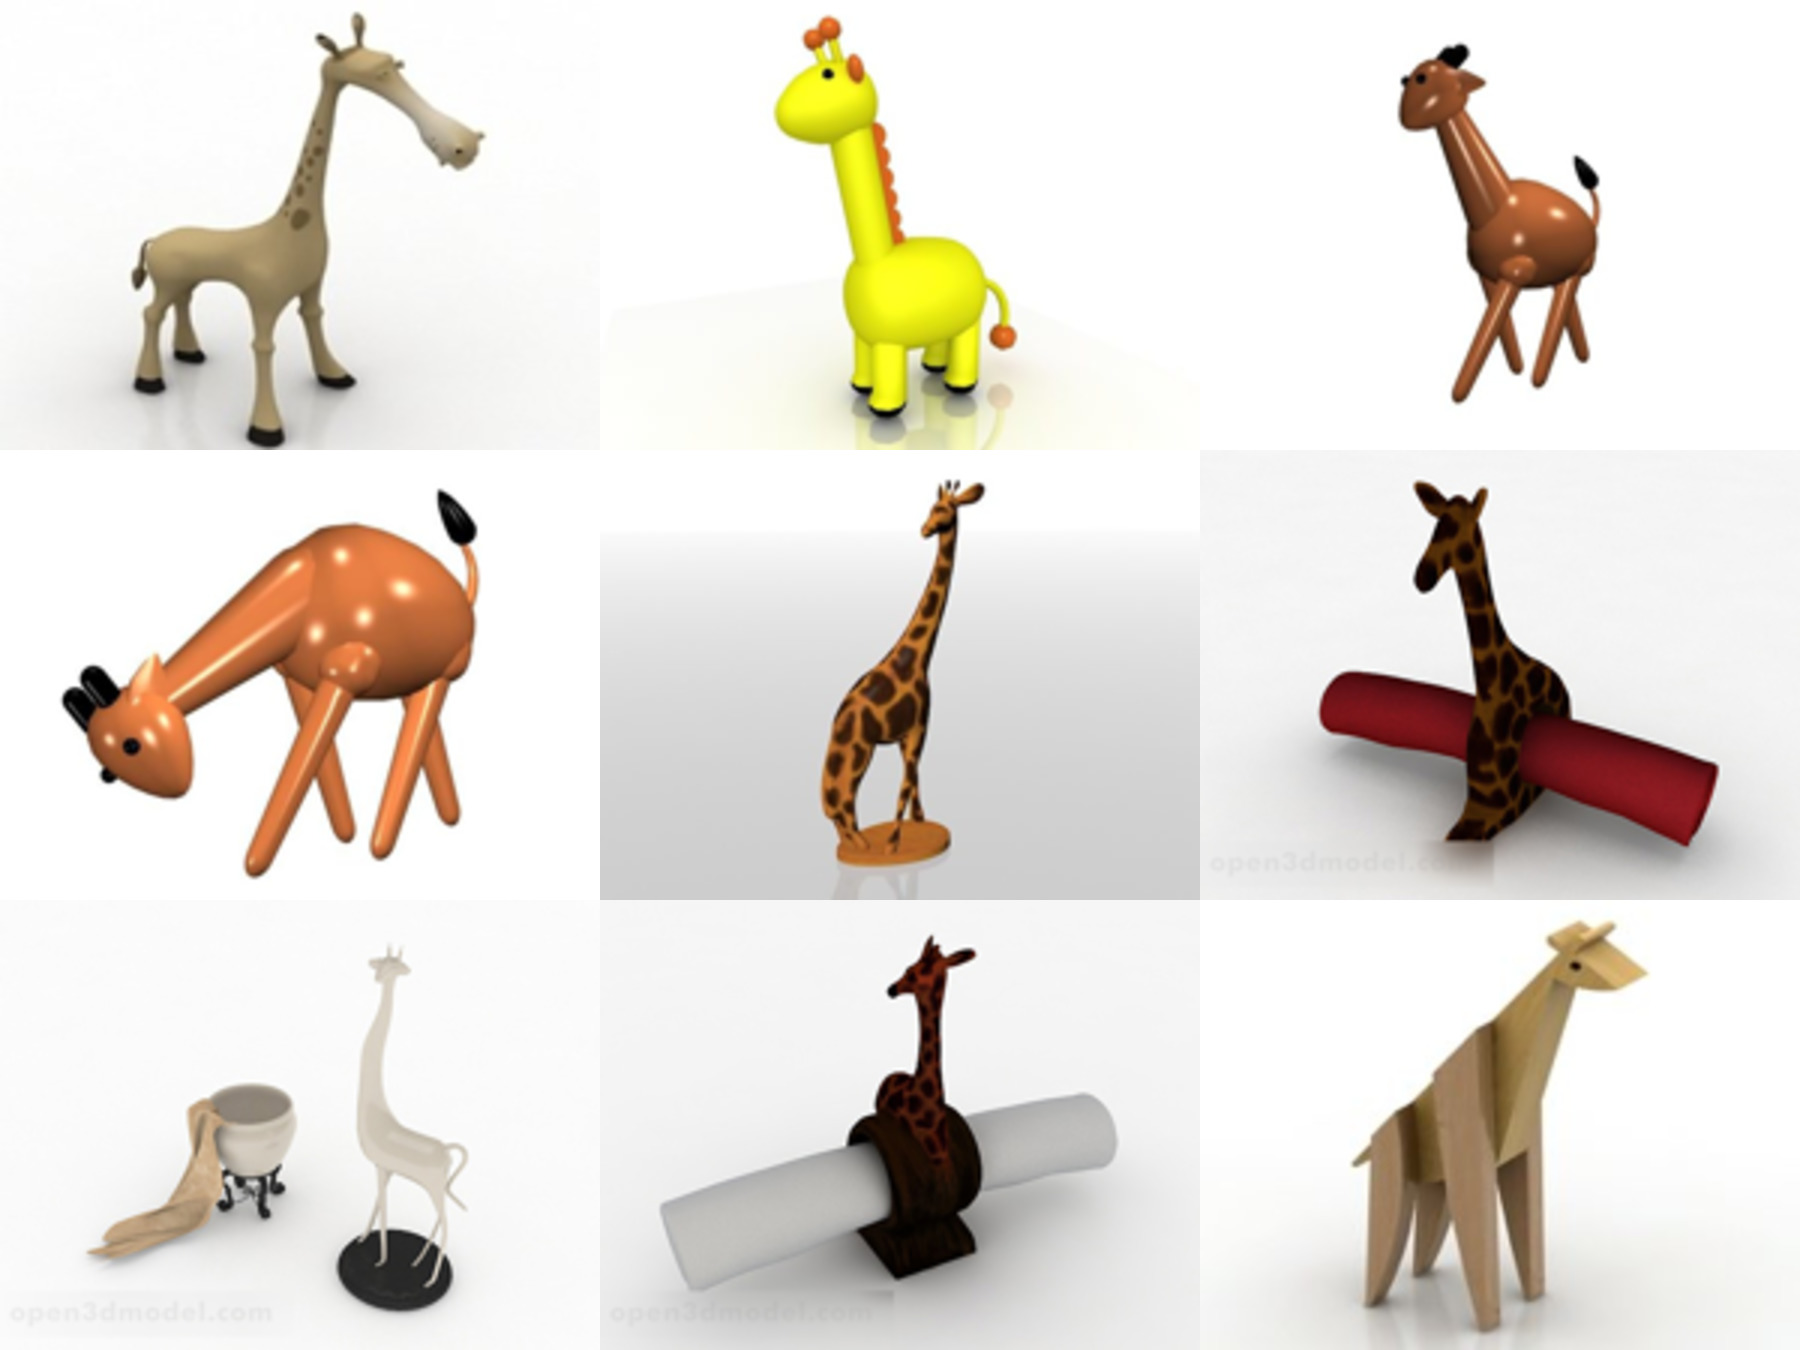 10 Giraffe Toy Free 3D Models